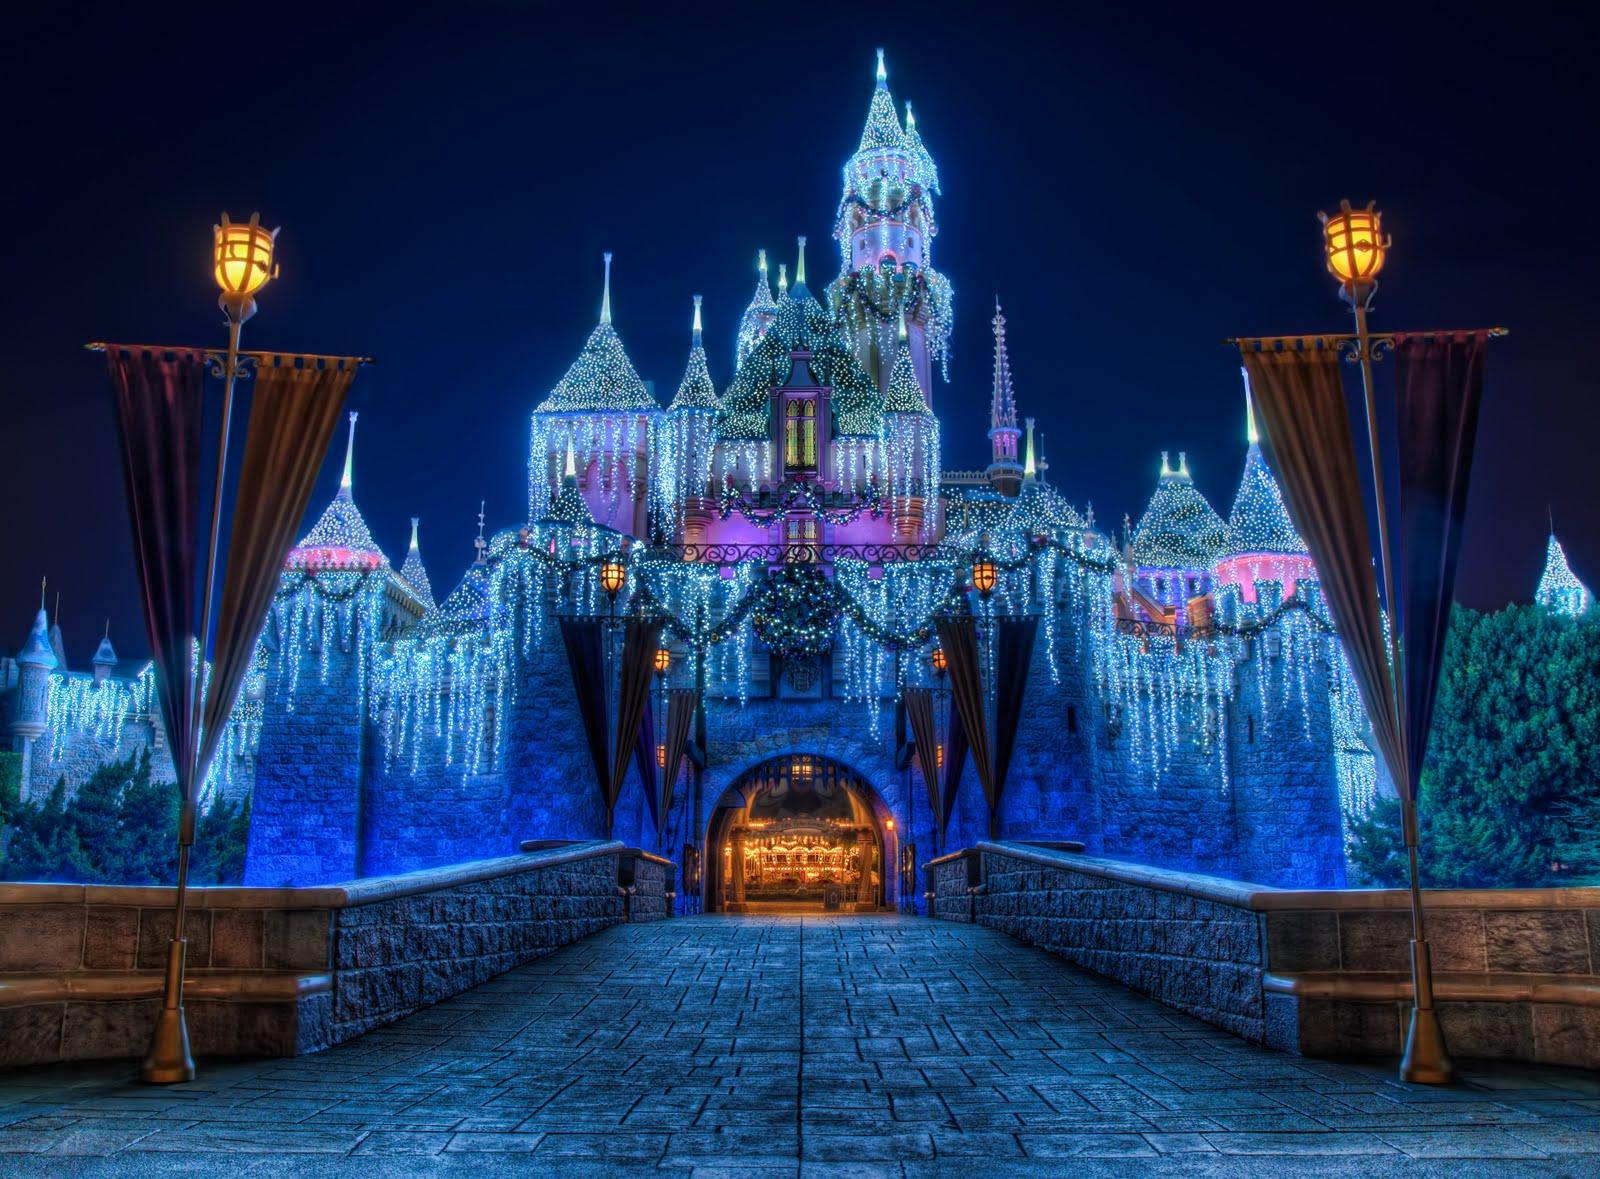 Disneyland Castle At Night Disneyland Christmas Castle